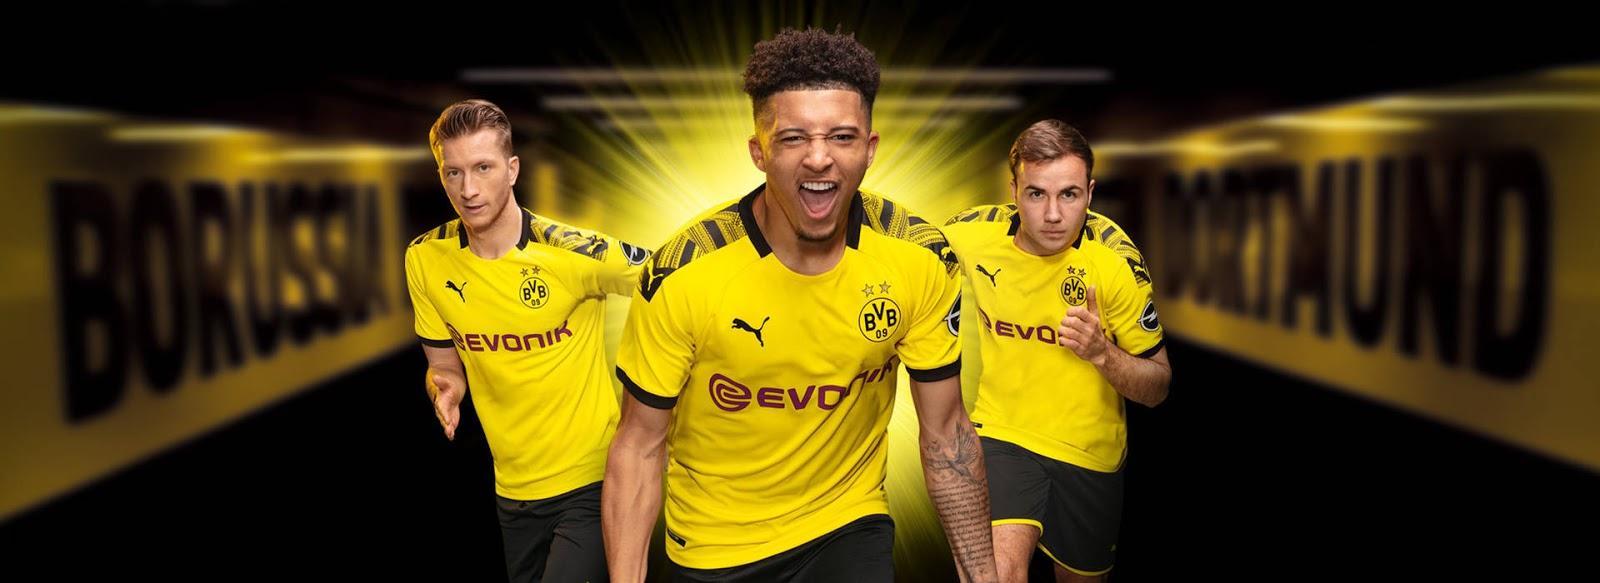 Borussia Dortmund 19 20 Home Kit Released Footy Headlines